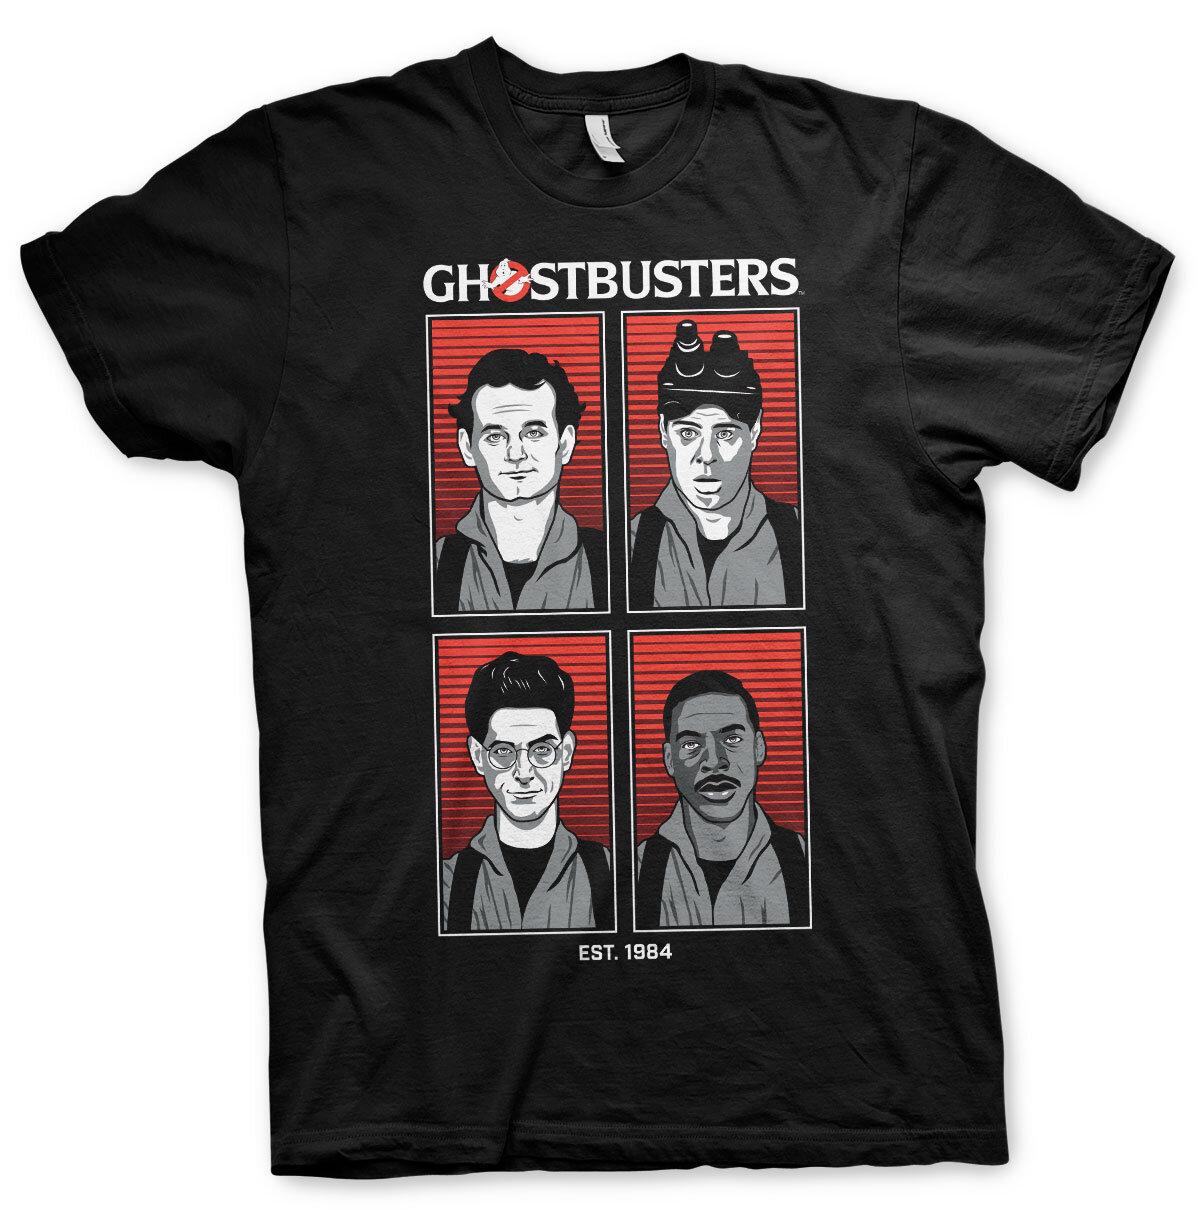 Ghostbusters Original Team T-Shirt